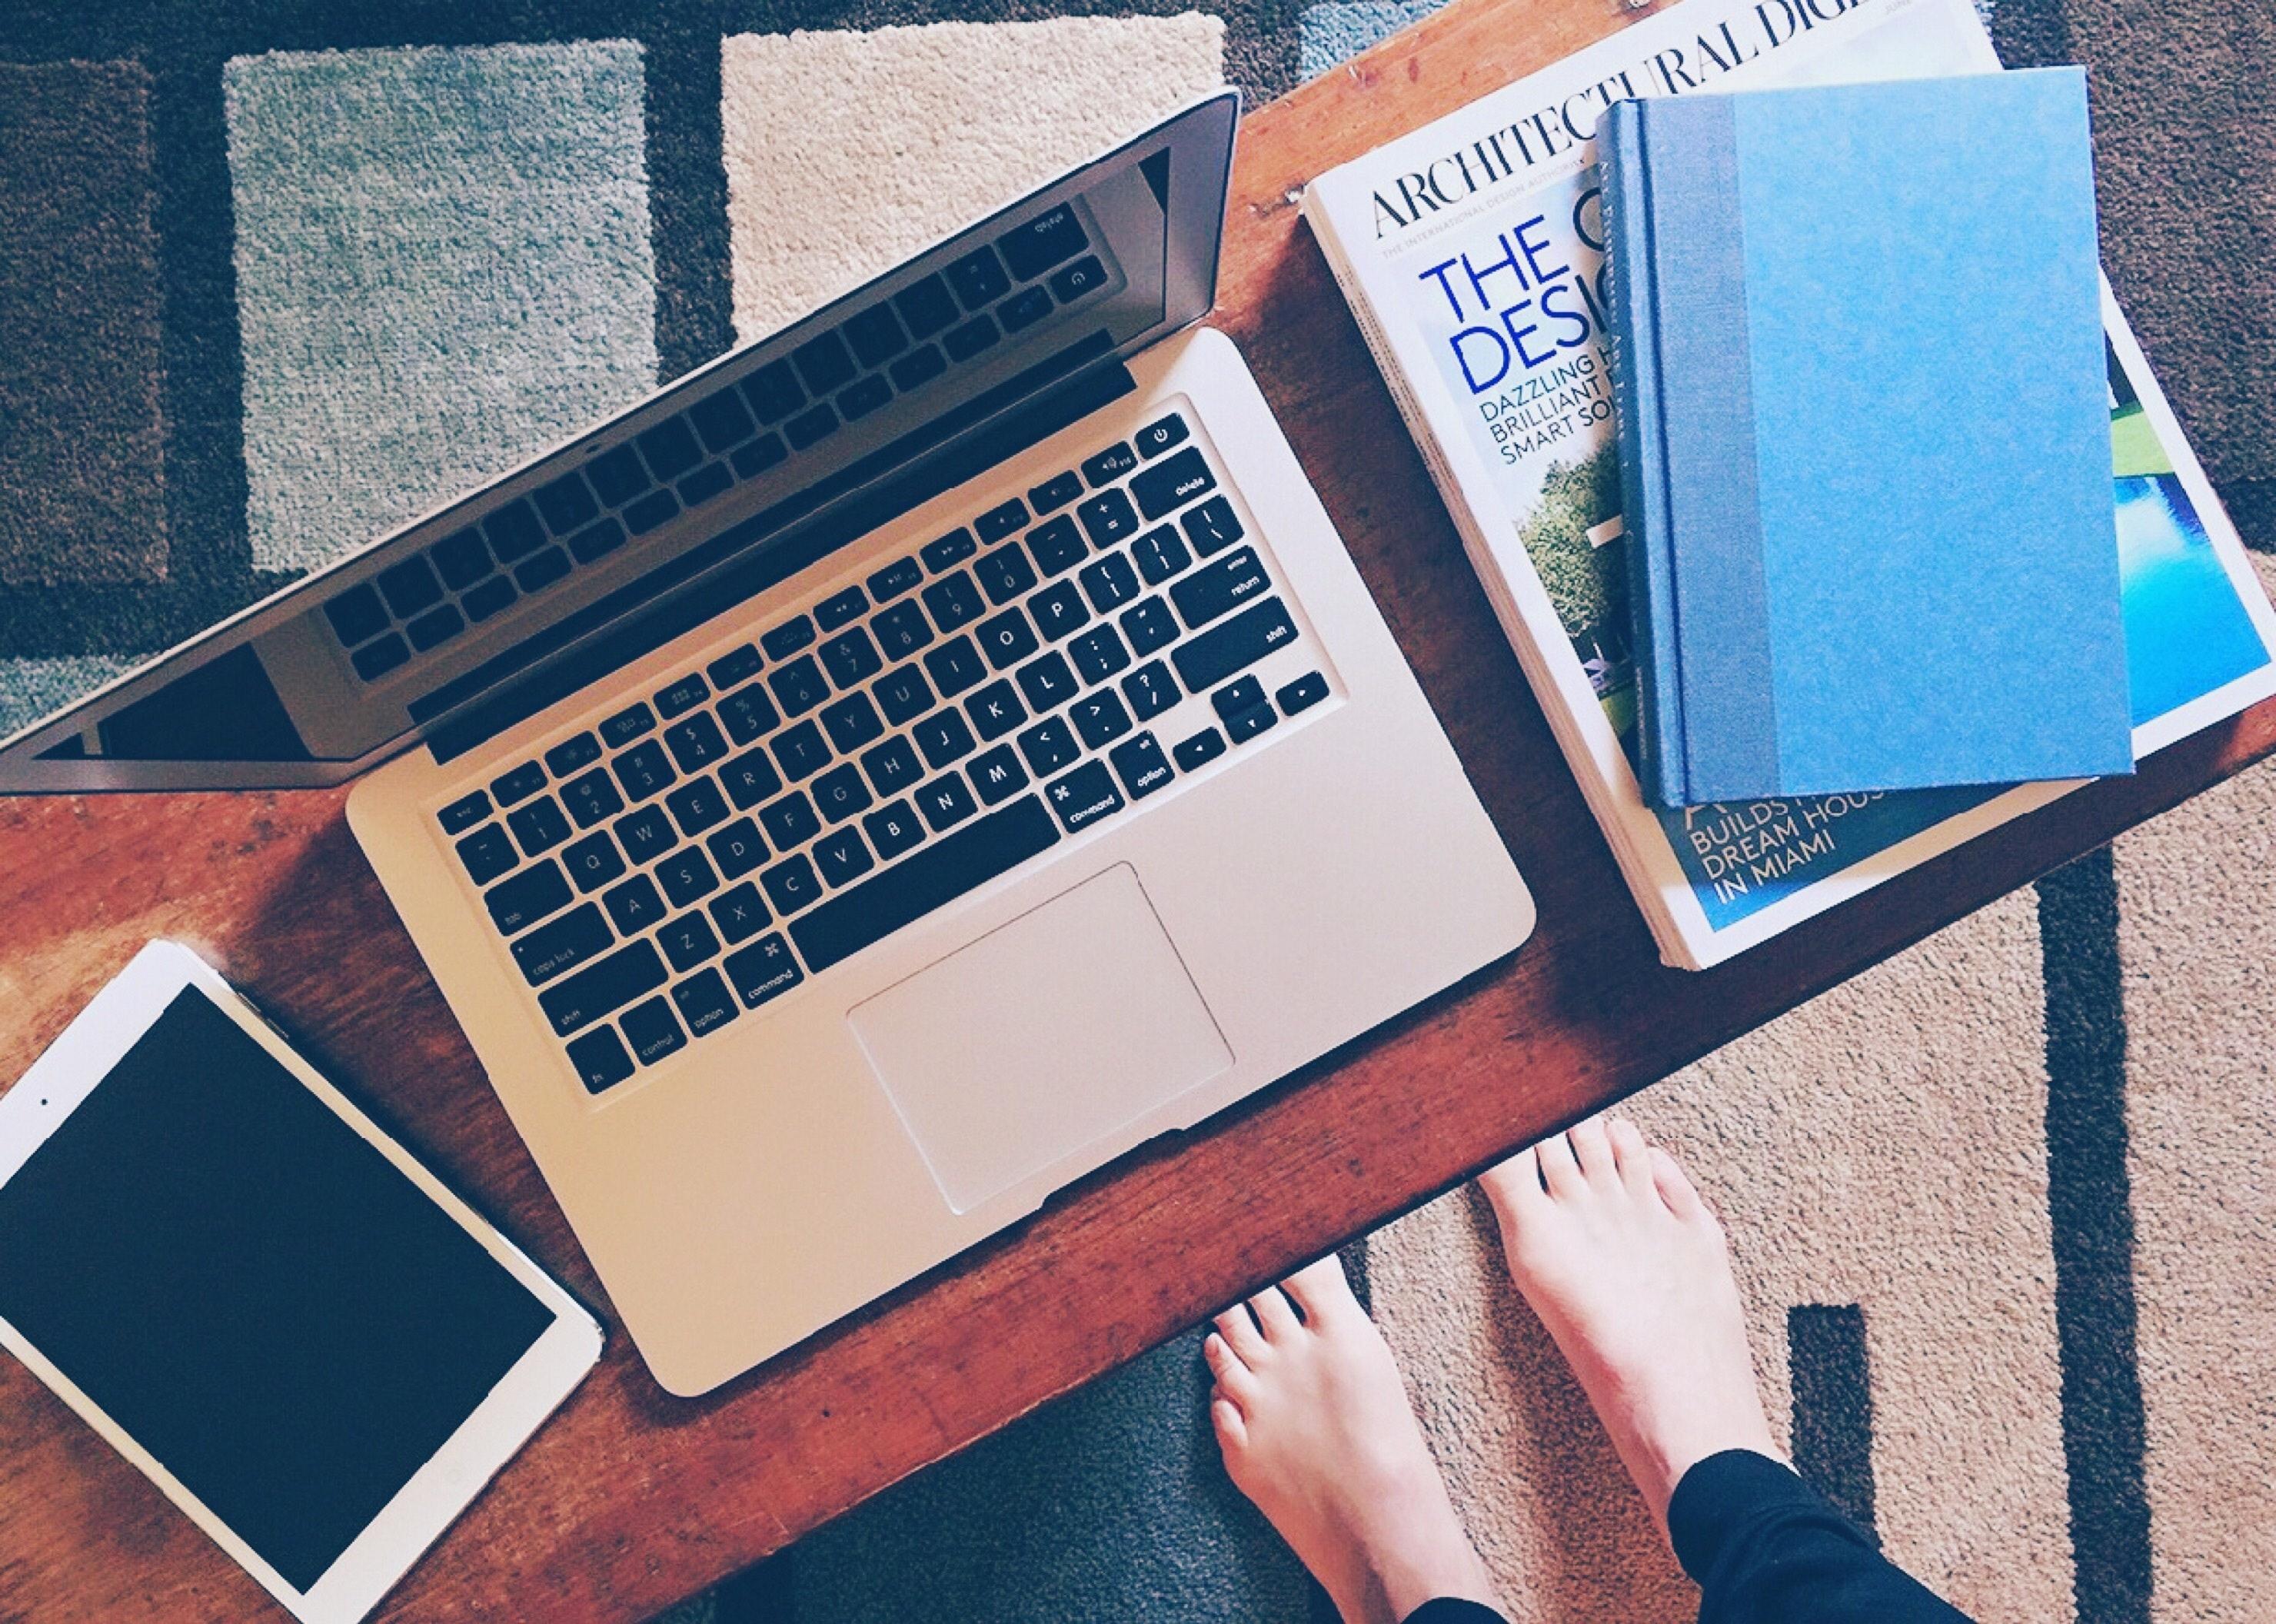 Macbook pro on brown wooden desk photo